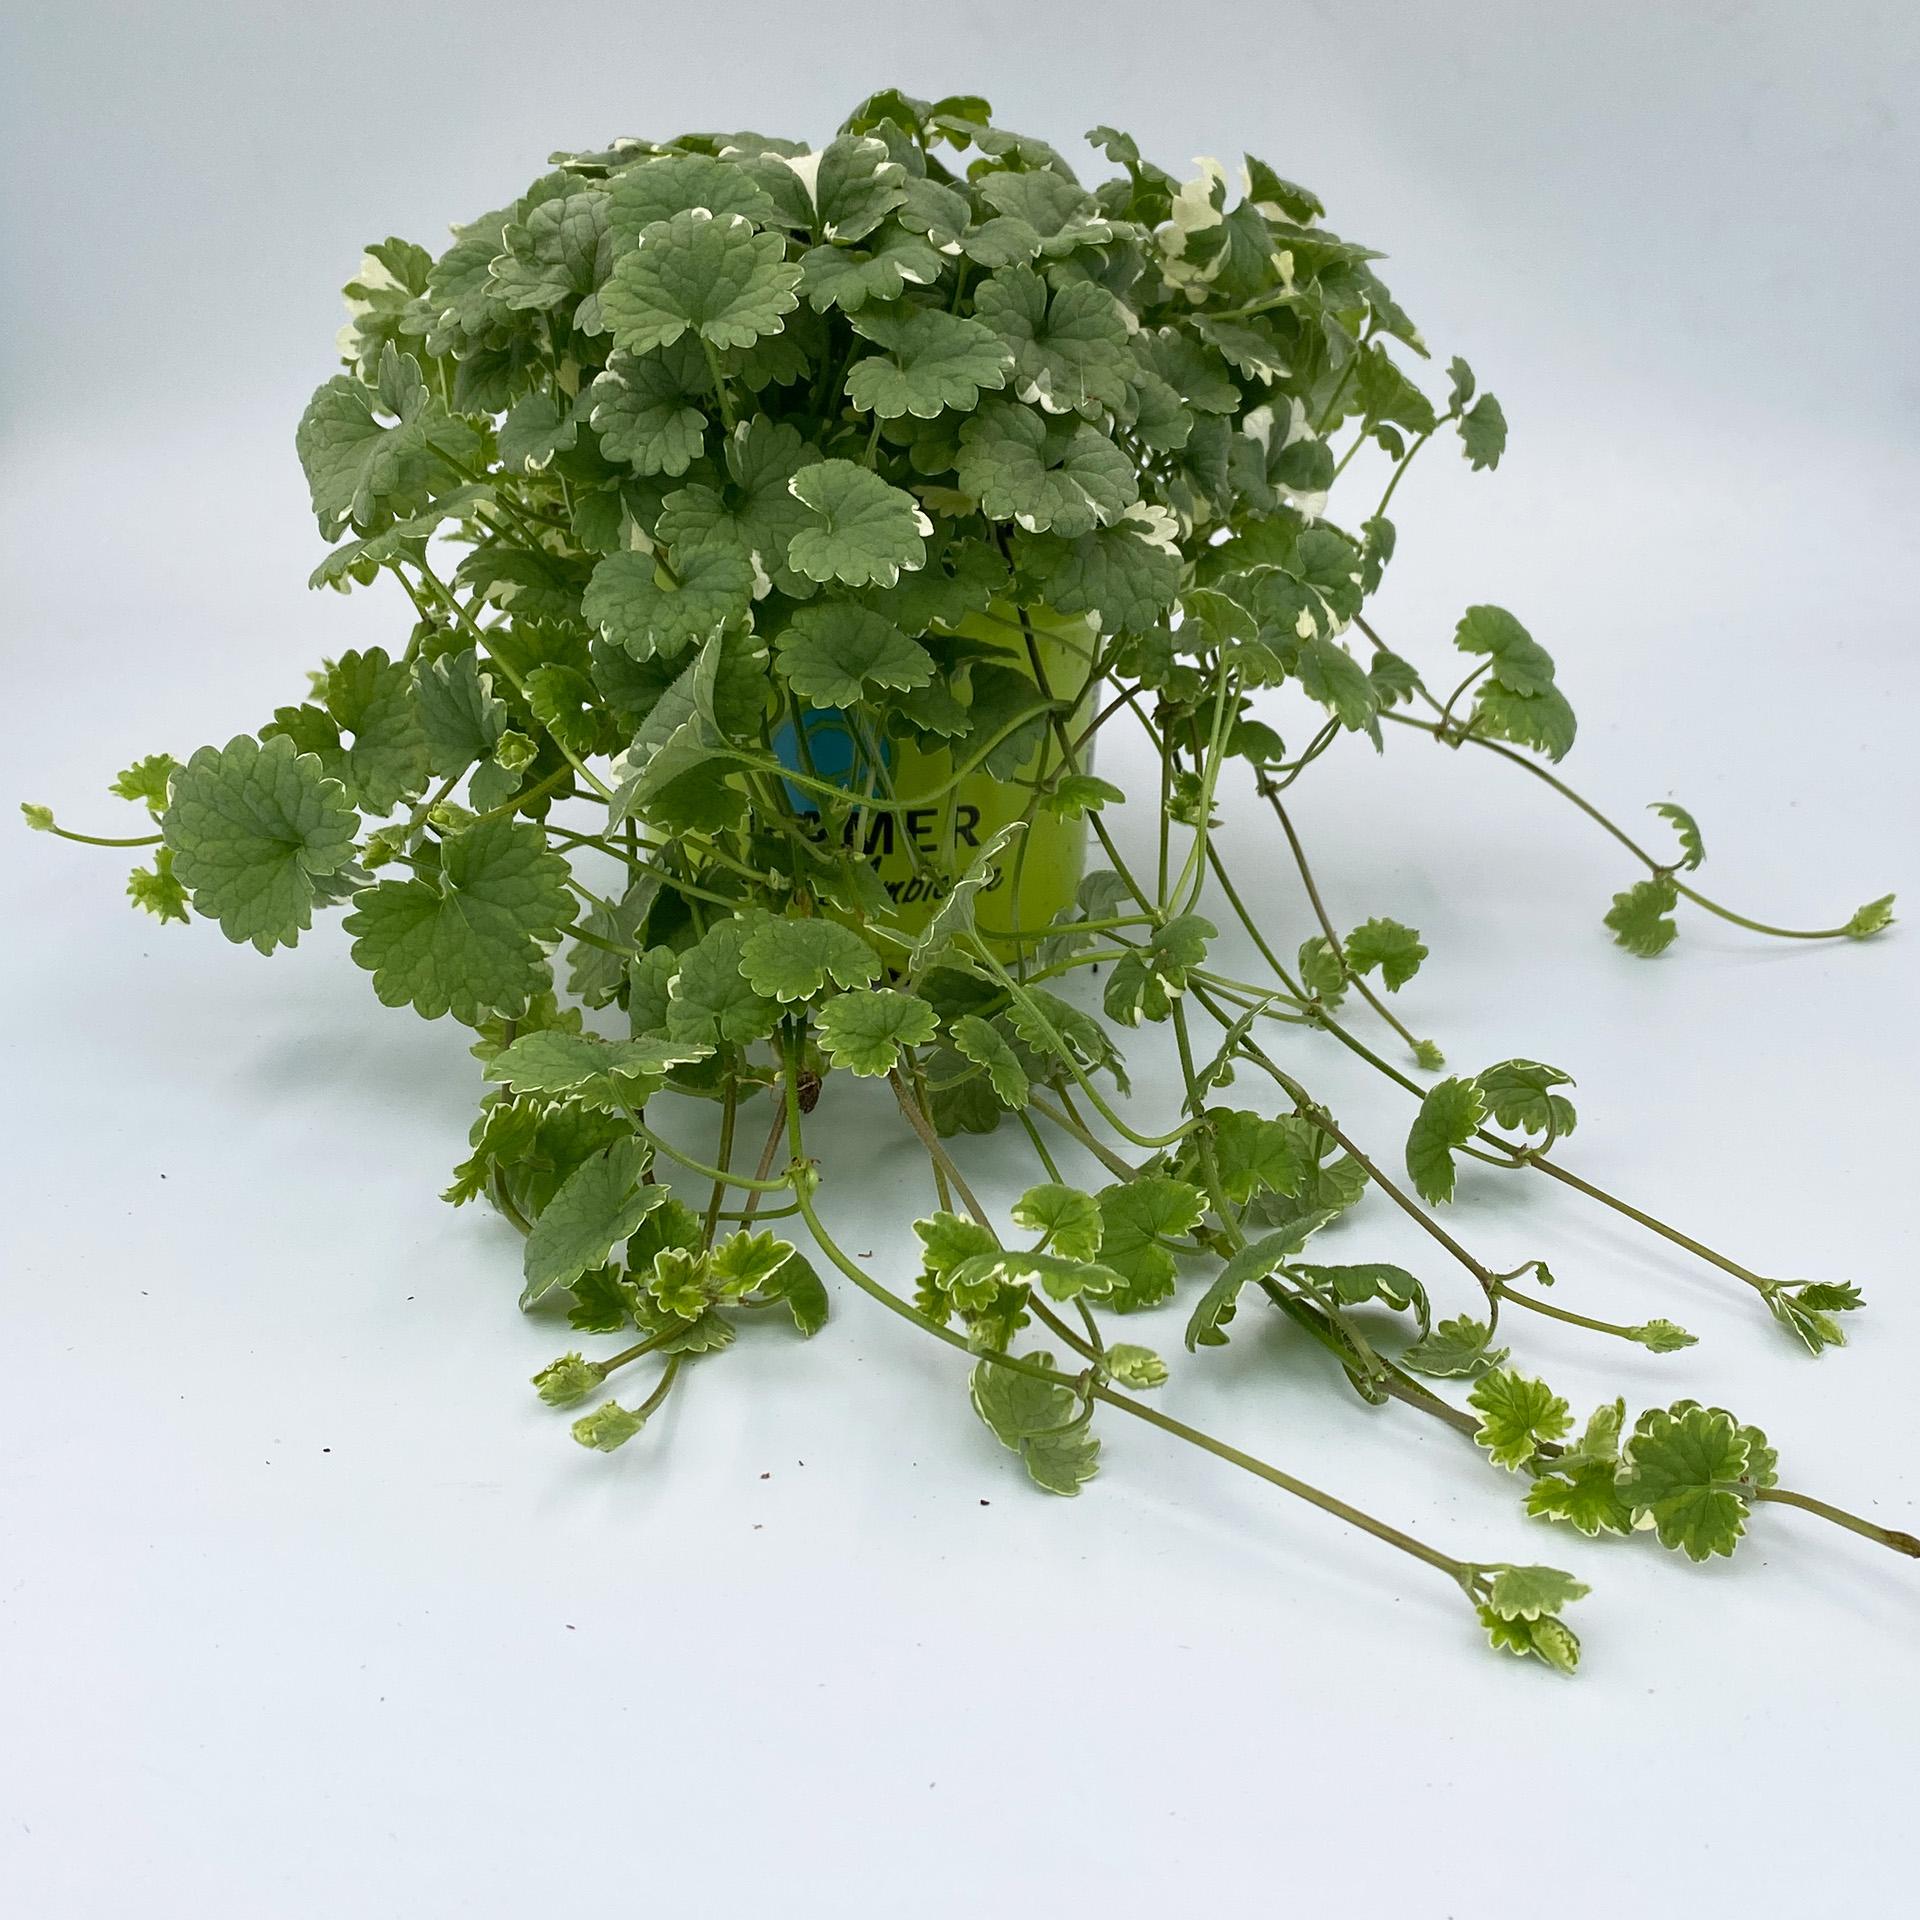 Gundermann - Glechoma hederacea 'Variegata' weiß-bunt, 12cm Topf